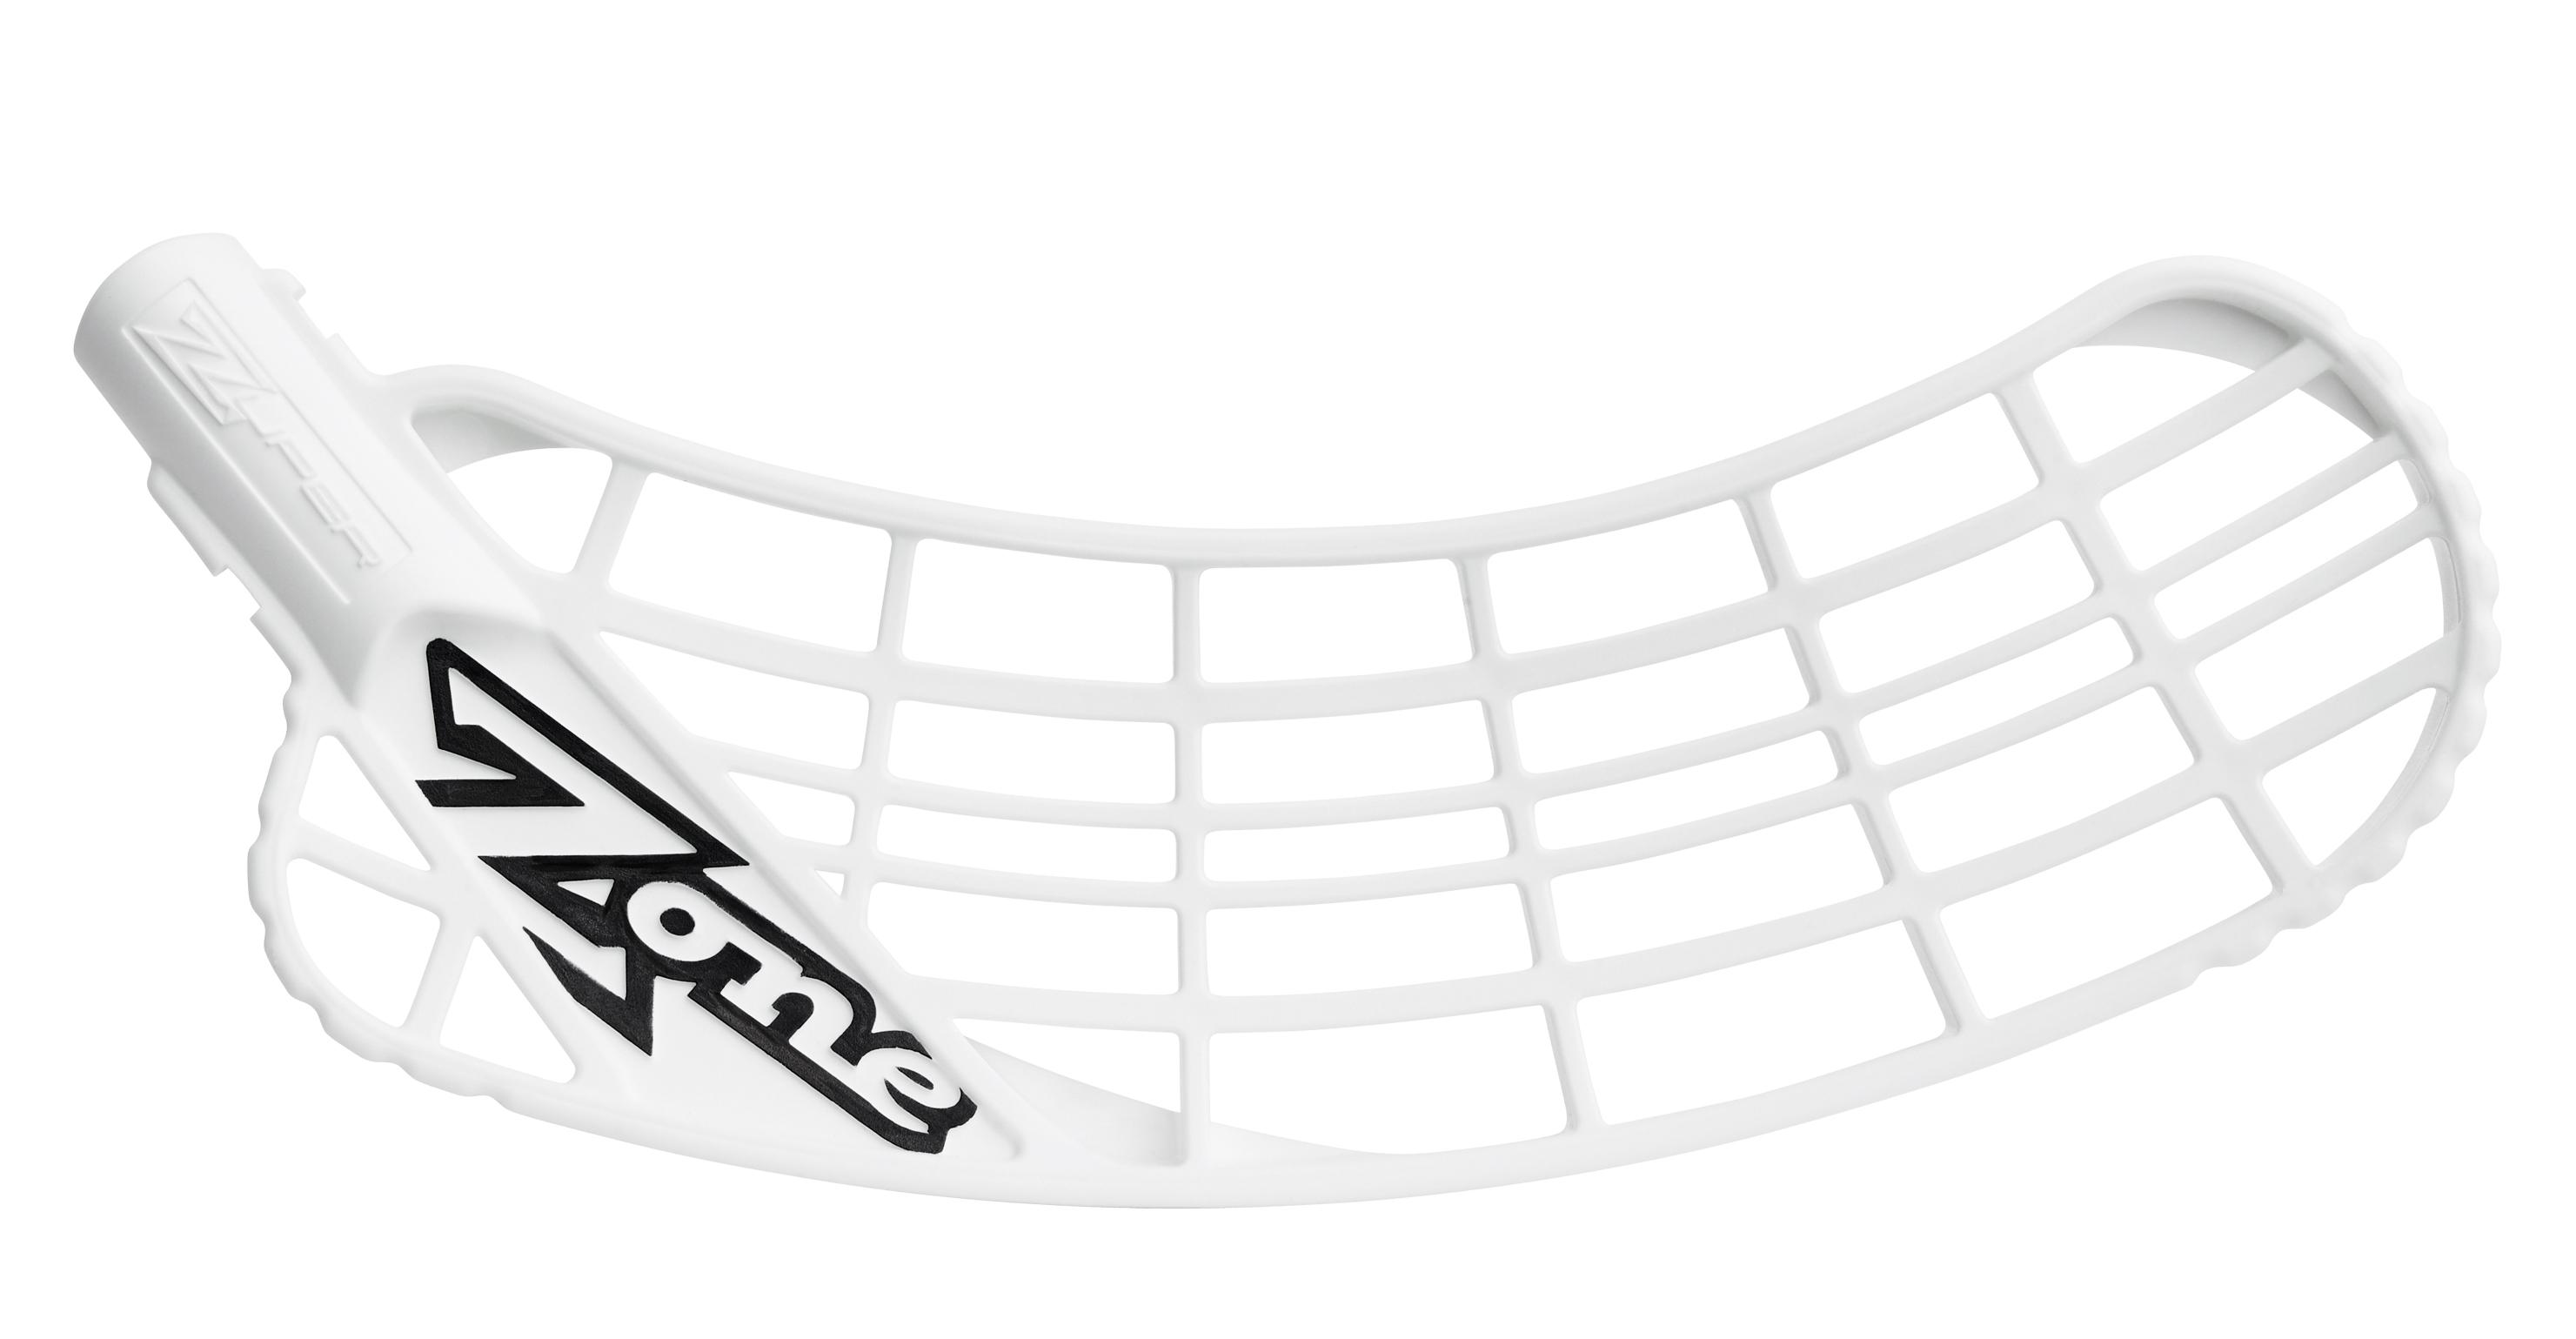 Zone Zuper Blade Medium Air Soft Feel - Hvid - R